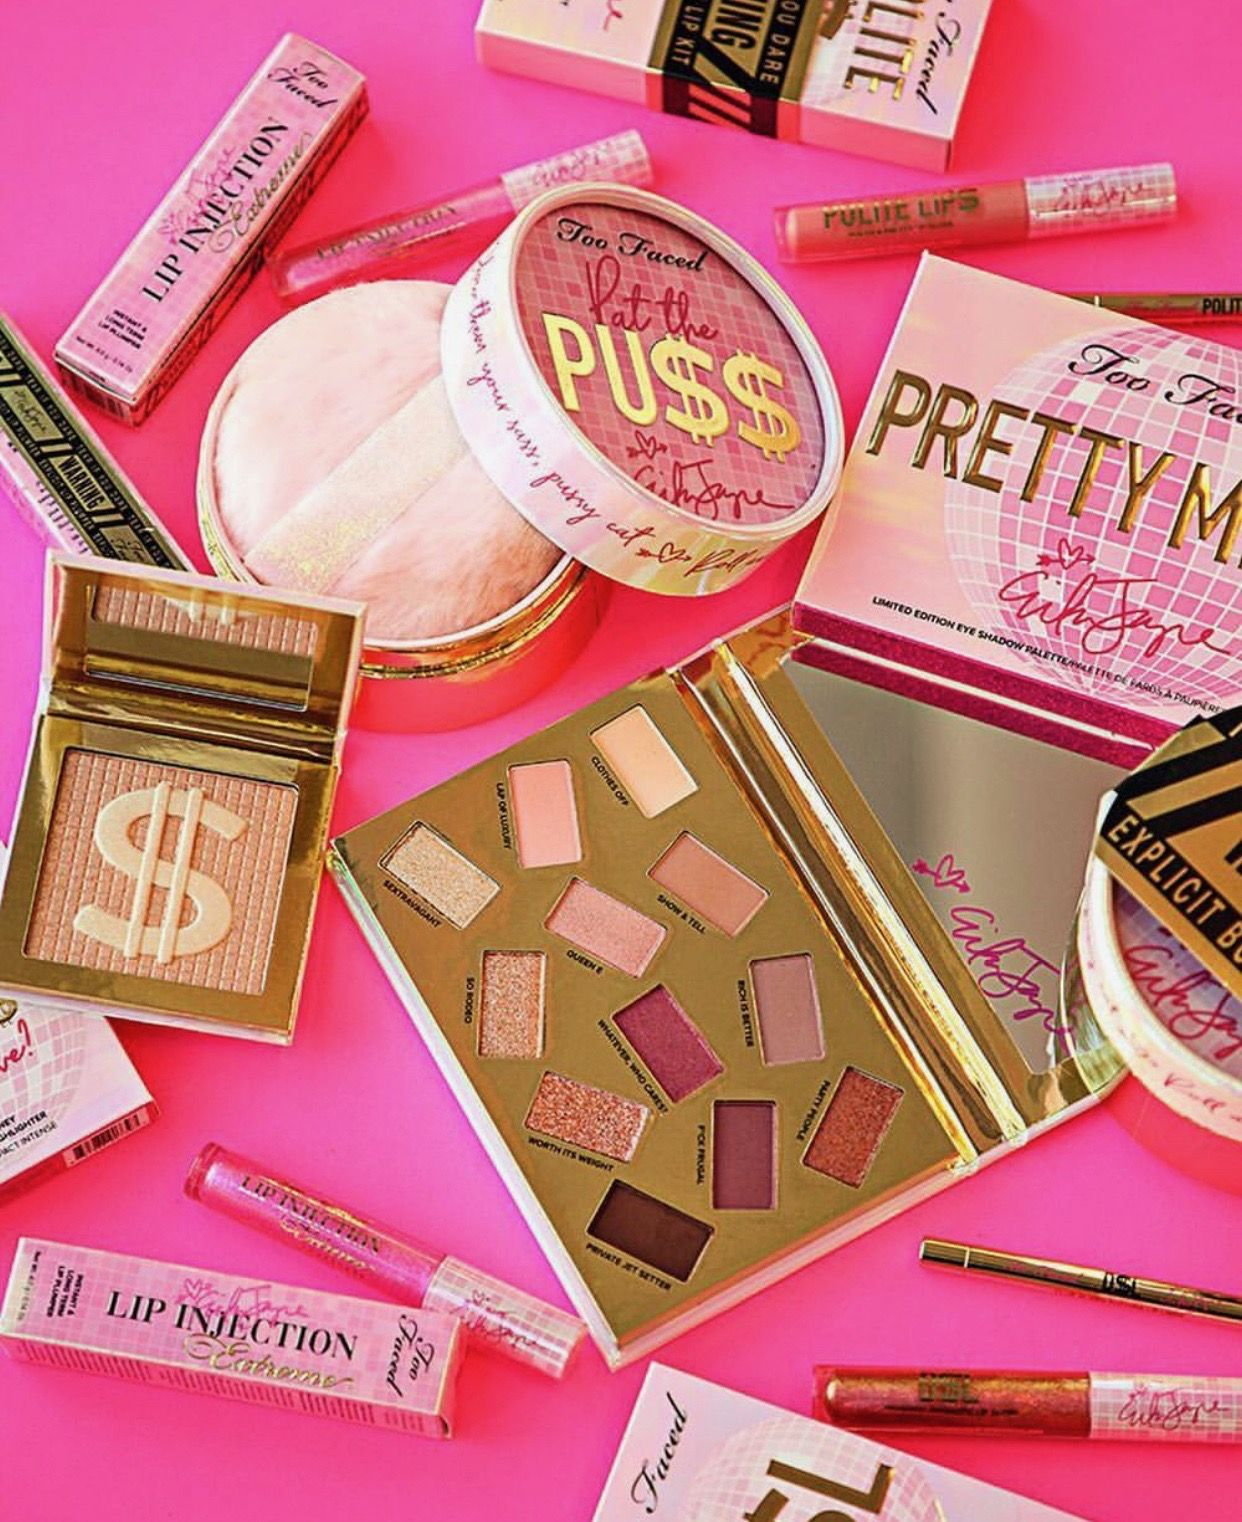 Makeup Releases 2019 New Makeup Too Faced Makeup News With